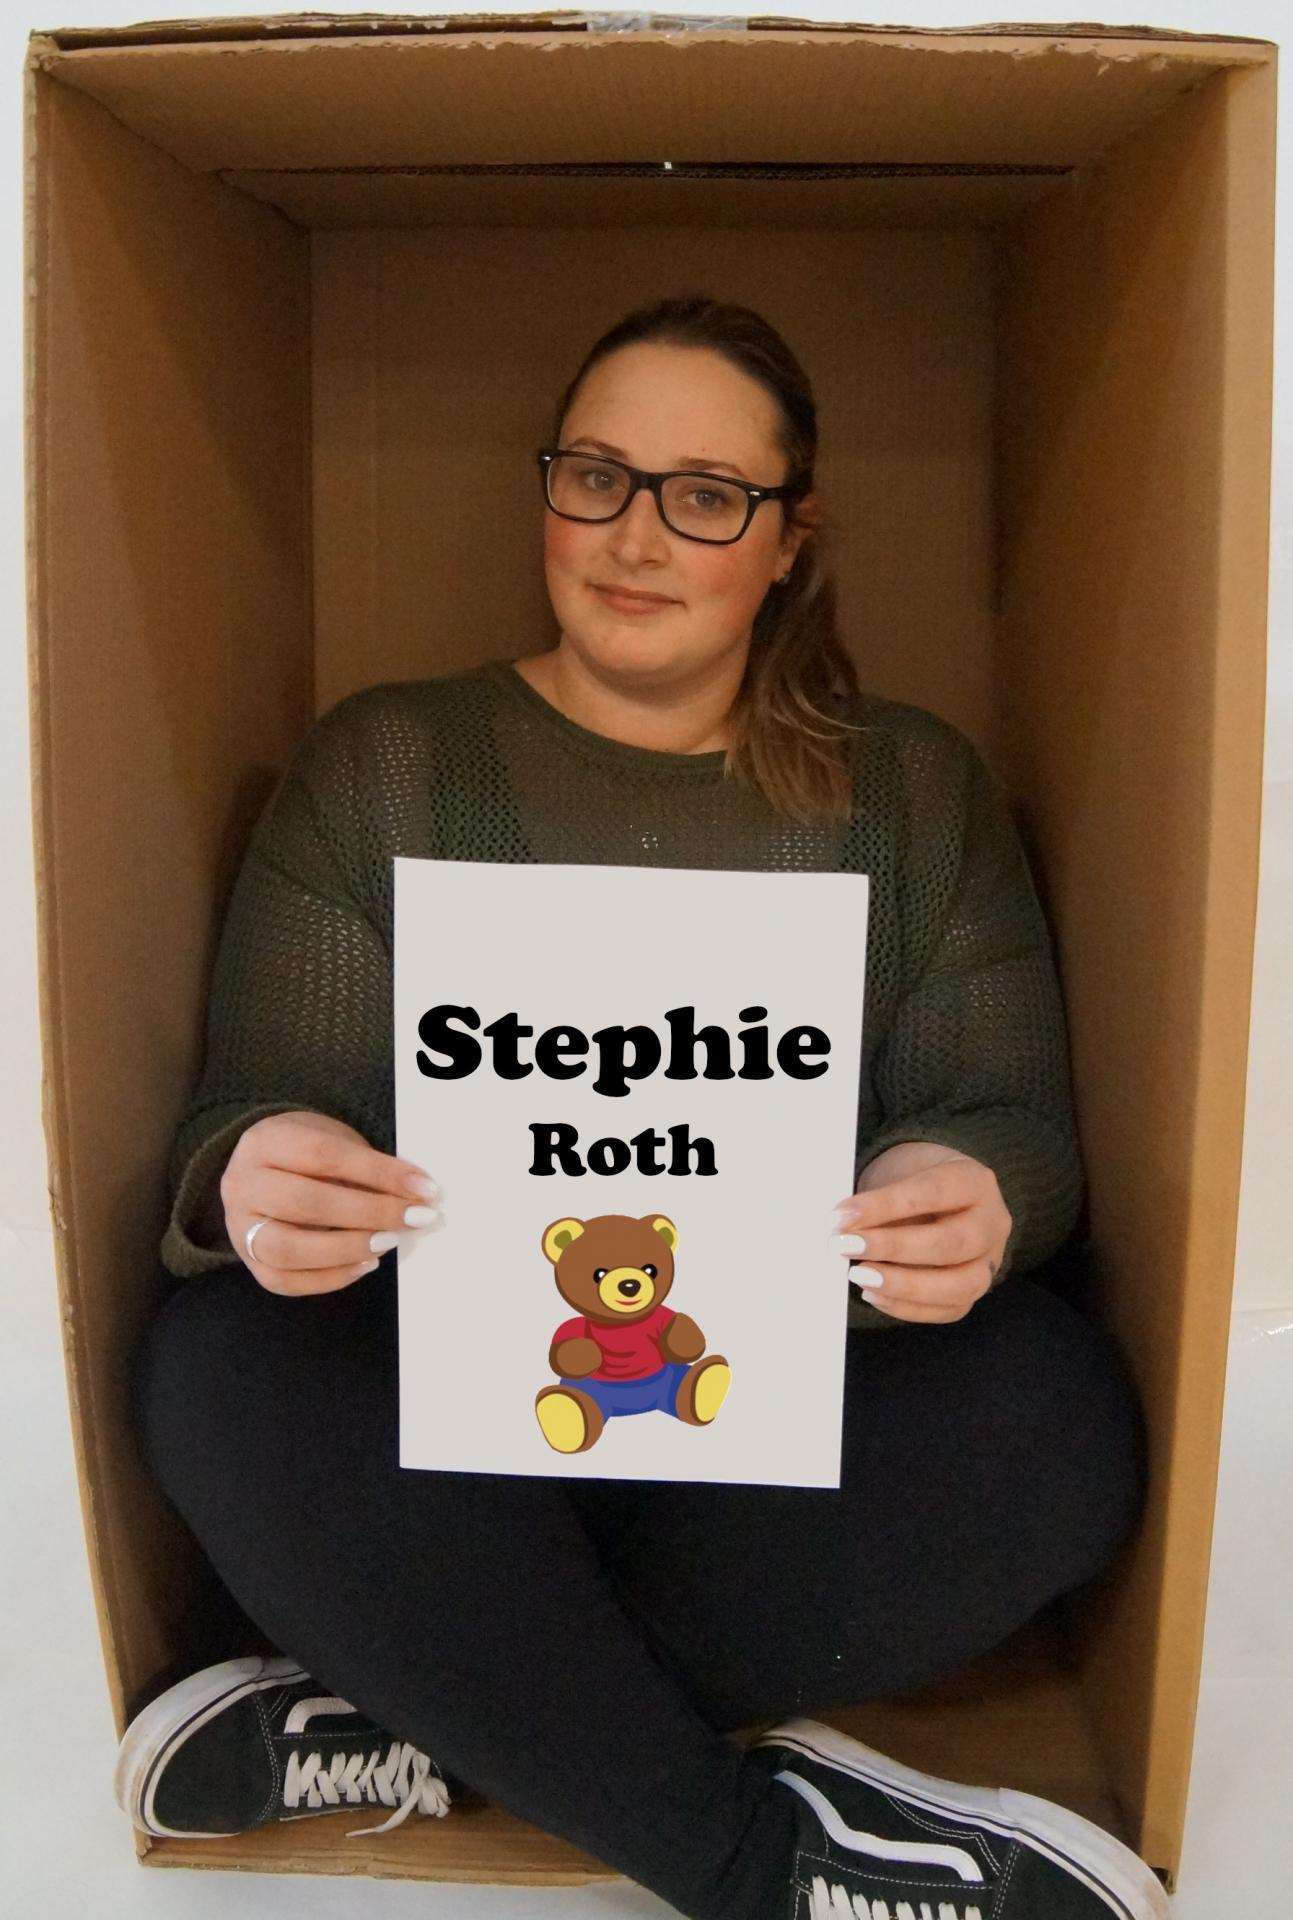 Stephie Roth